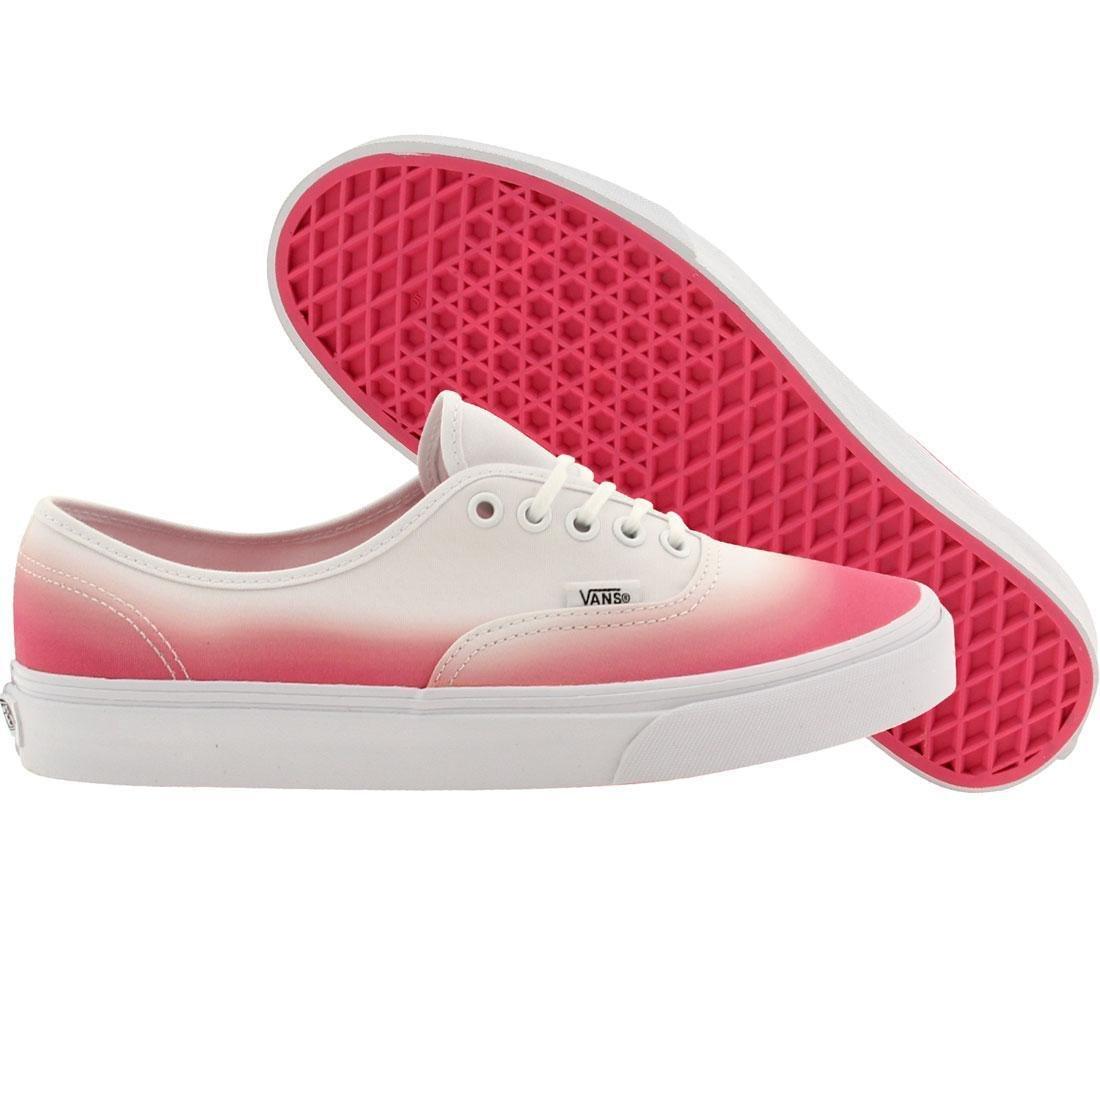 Vans Authentic Ombre Pink/True White Women 4 by Vans